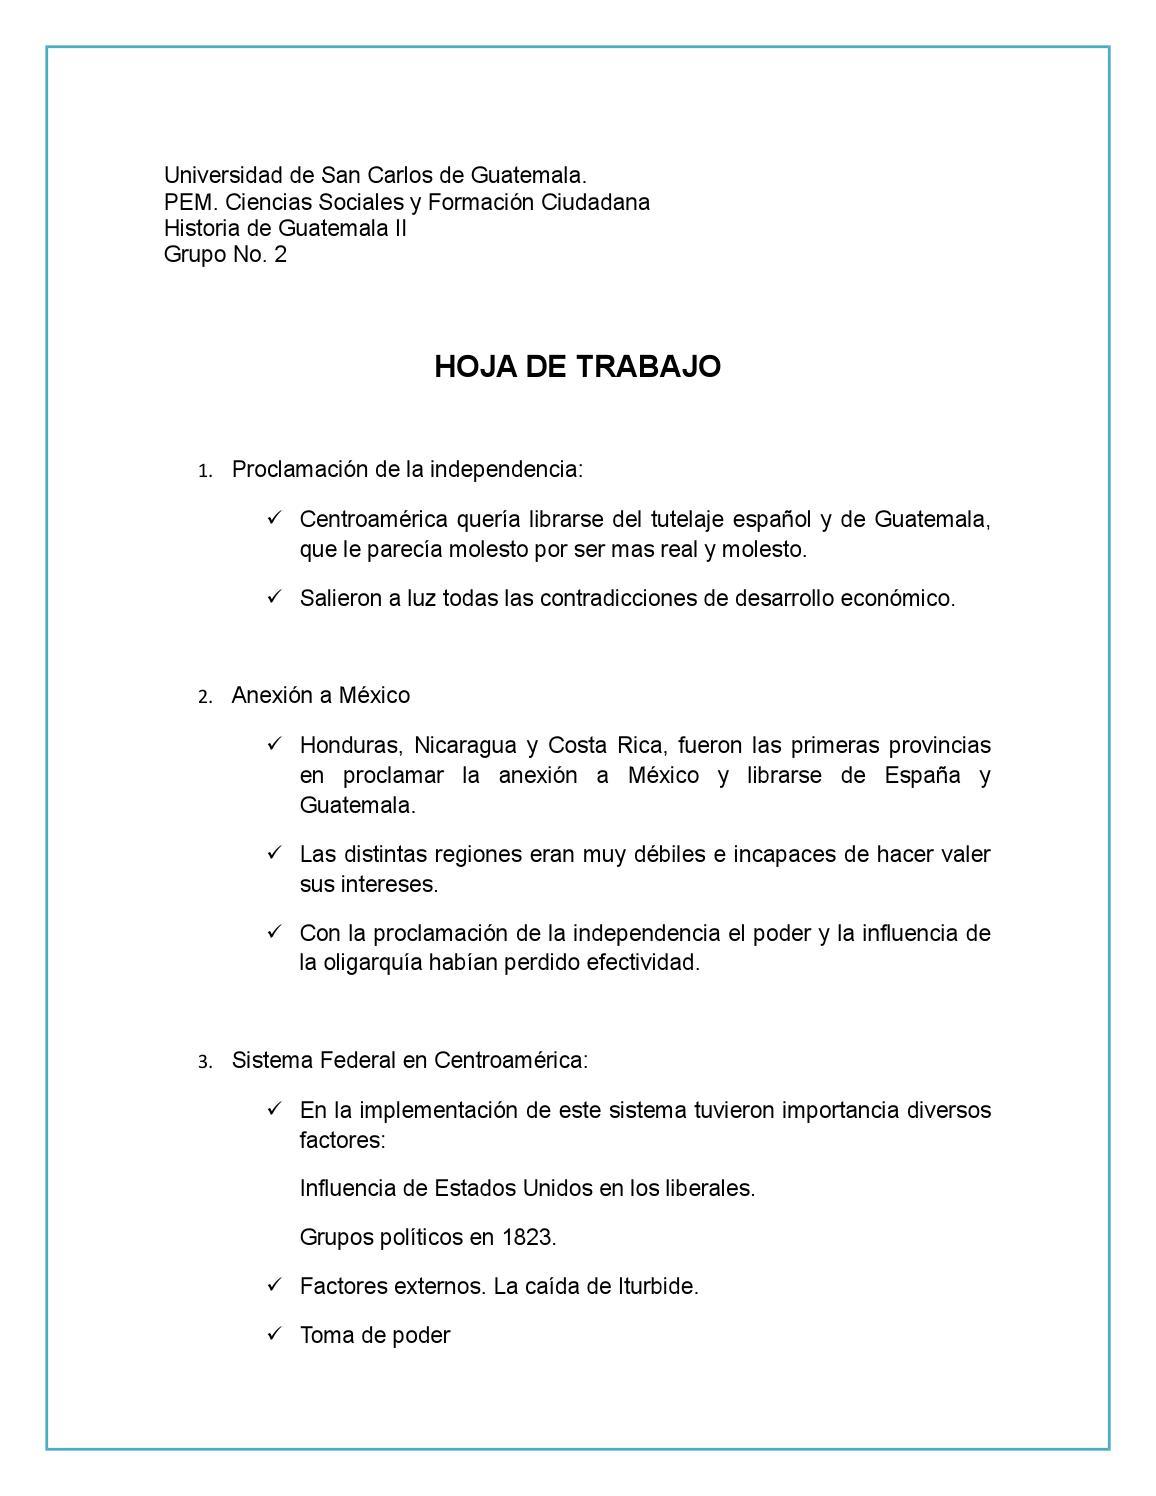 Hoja de trabajo grupal historia 2 by maria jose - issuu